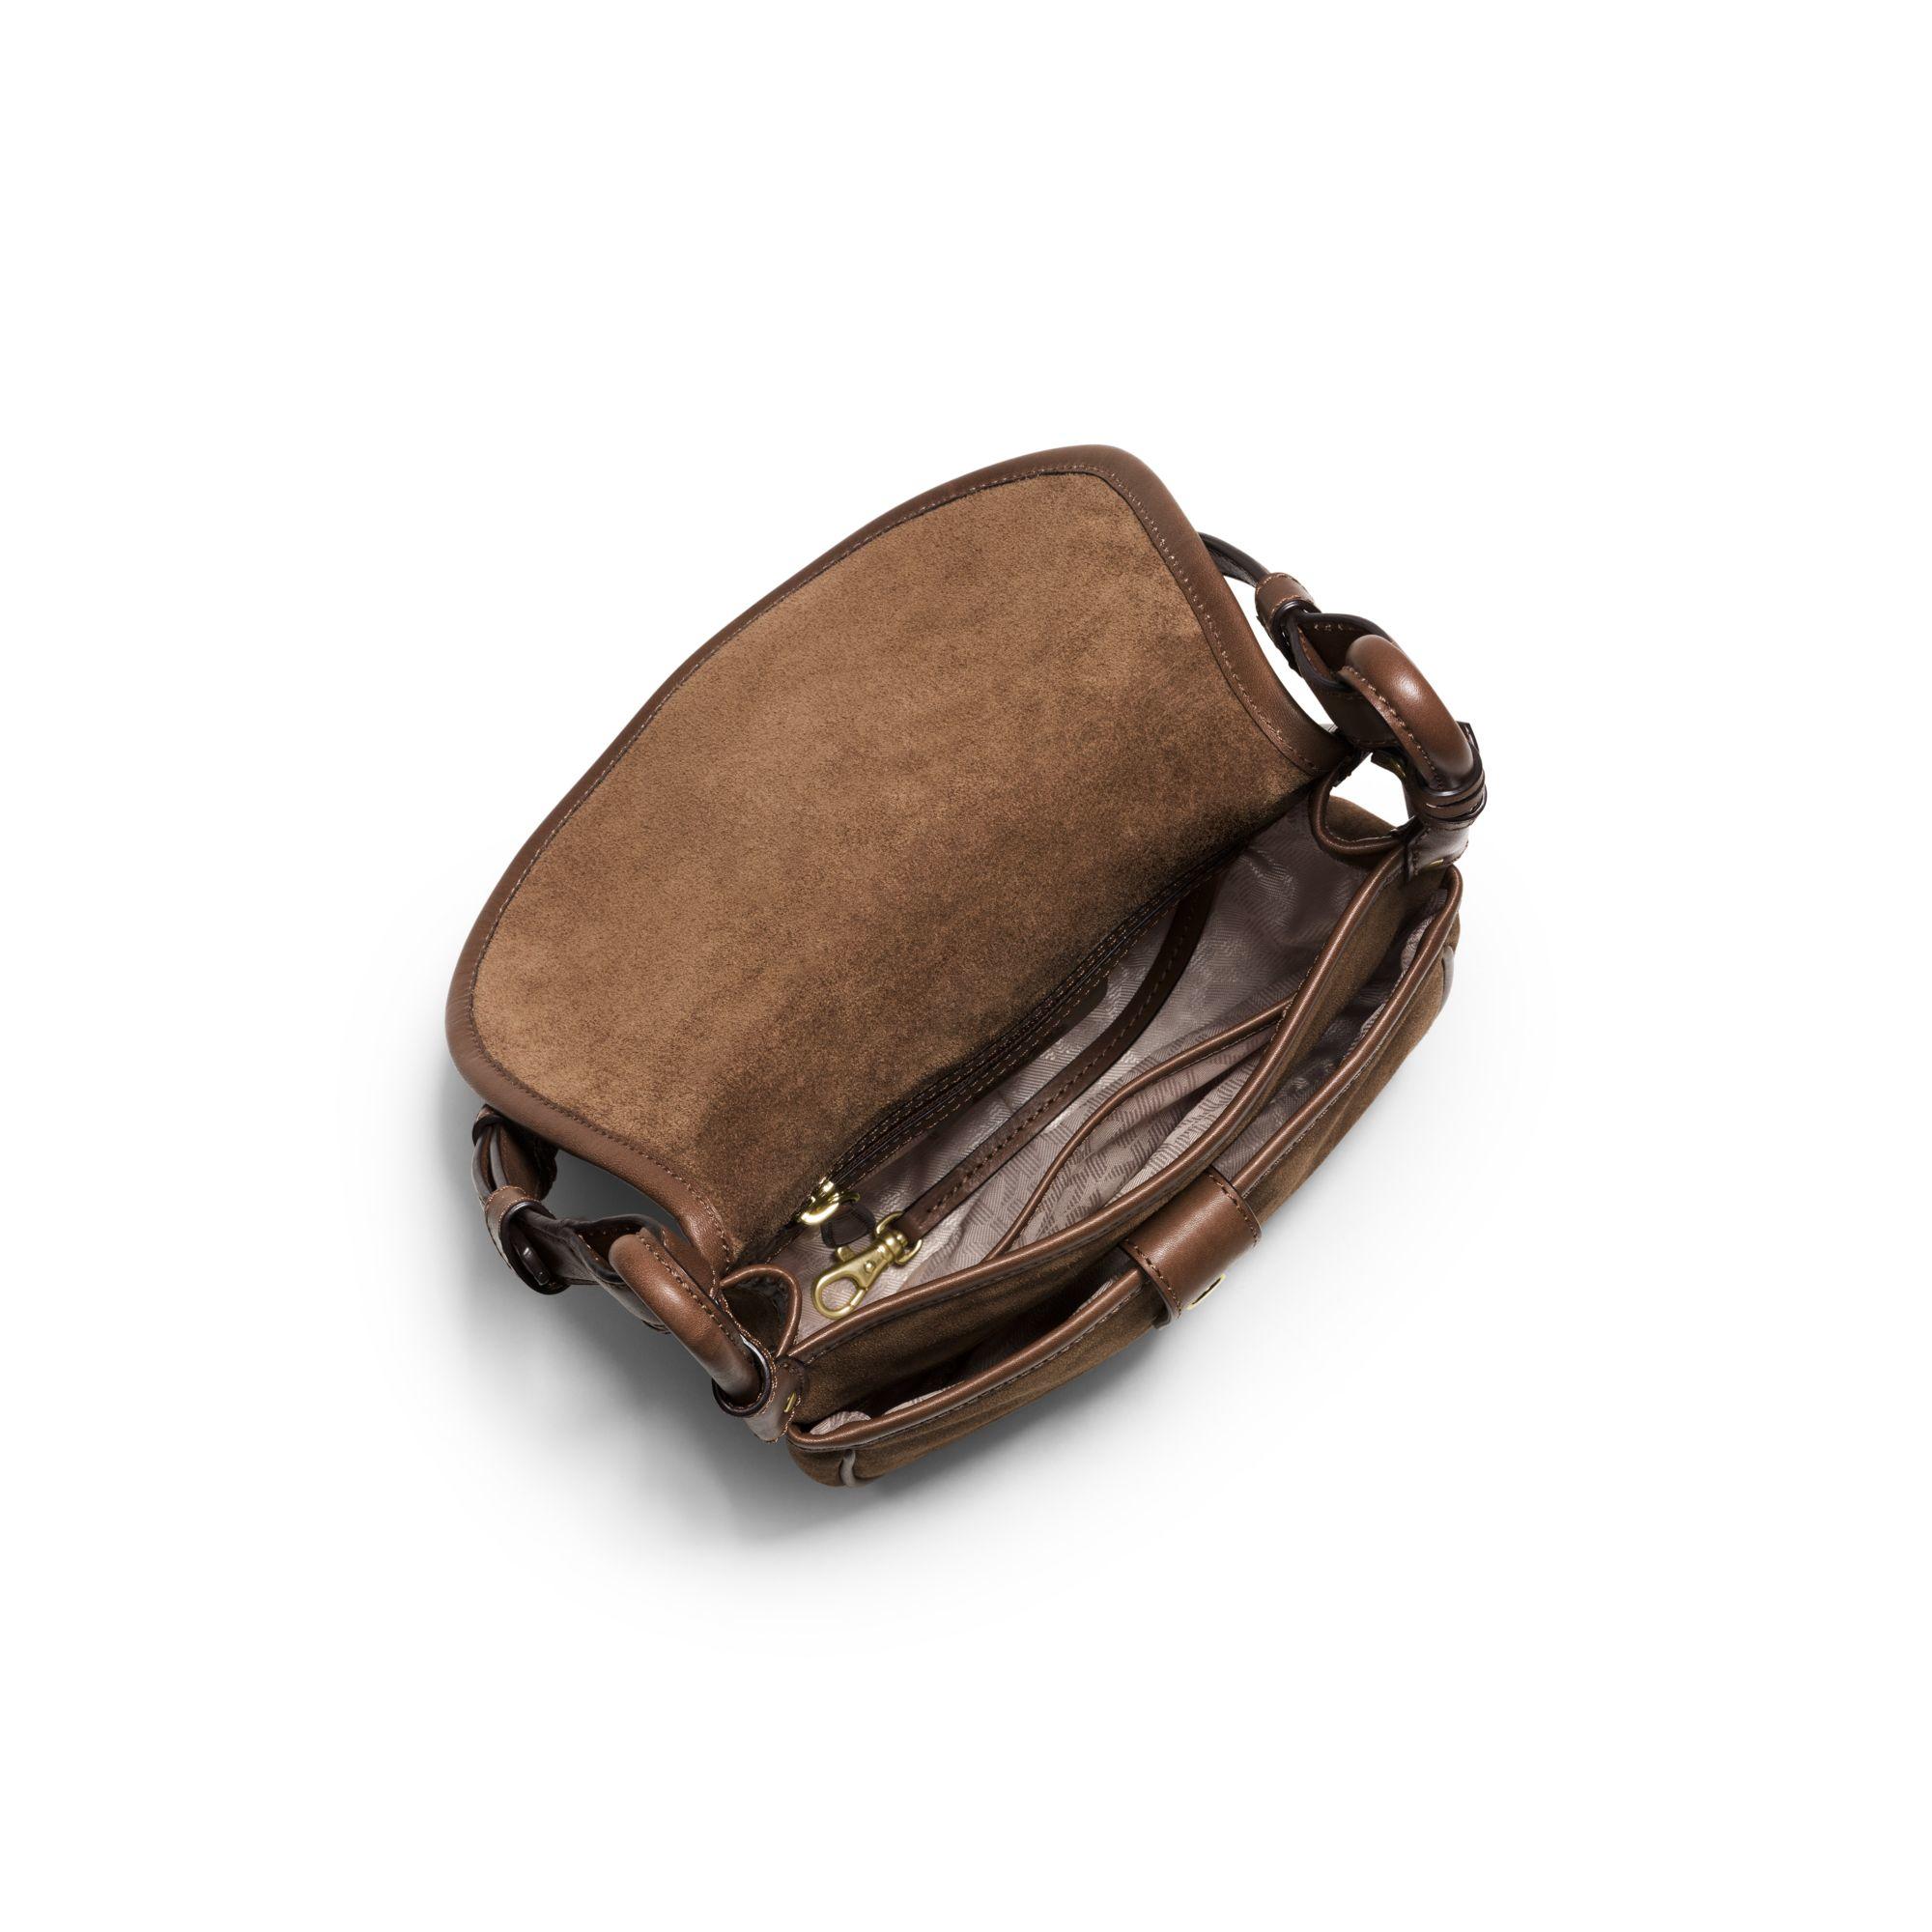 46cb47a2cbd940 denmark michael kors satchel handbags black d7287 44c0e; get bag in brown  lyst michael kors jamie medium suede crossbody in brown lyst 5d06b a1954